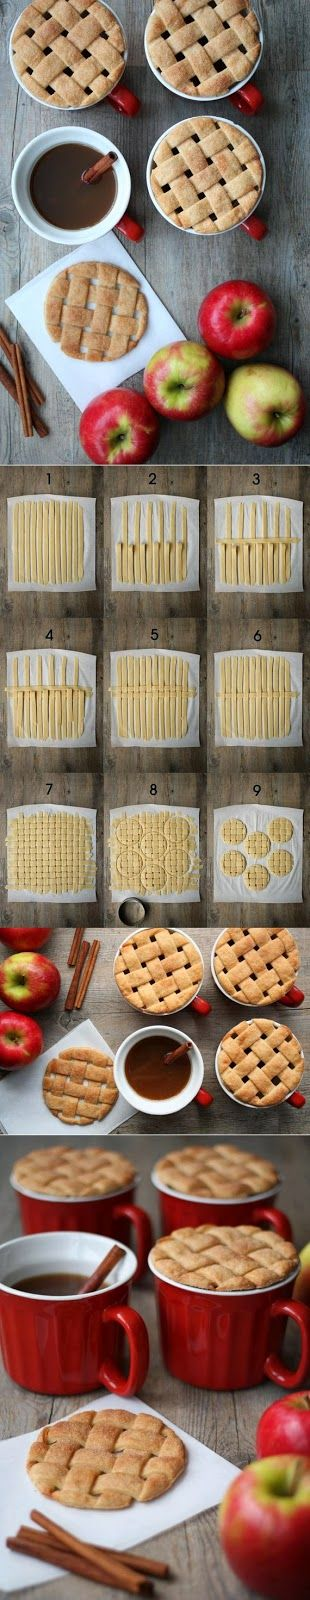 DIY Pie Mug Toppers | DIY & Crafts Tutorials